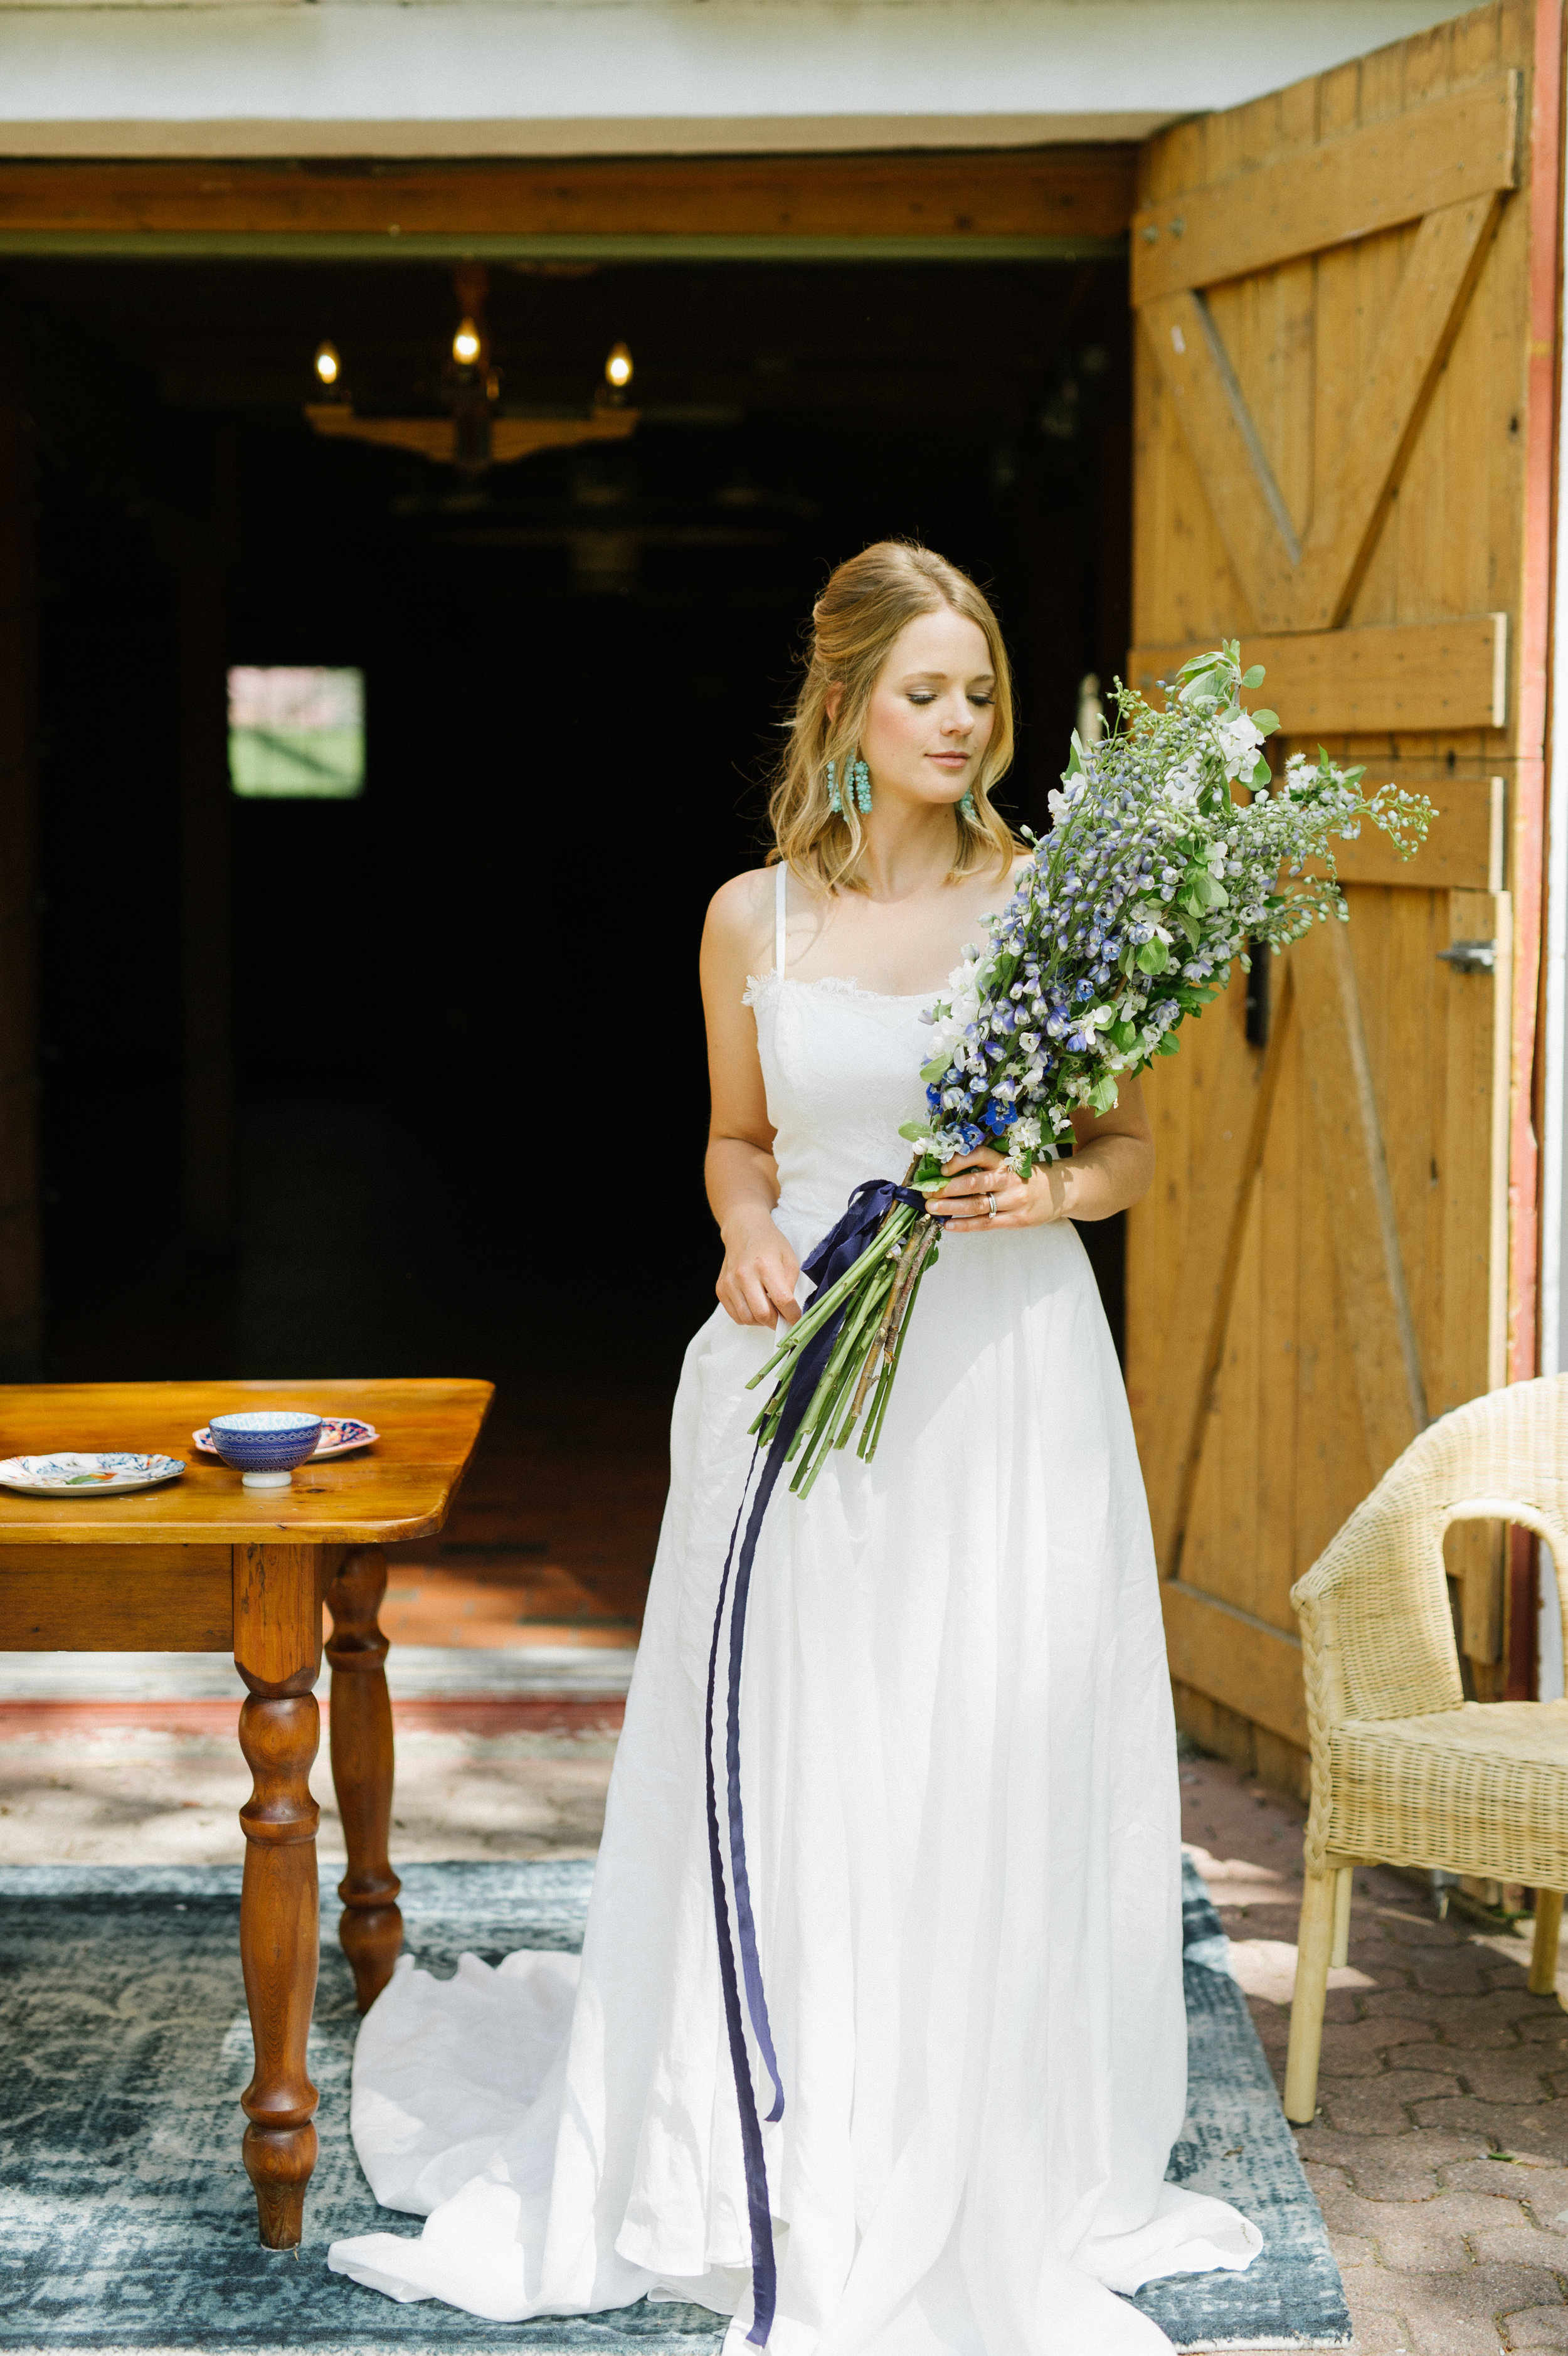 Calgary_Wedding_Photography_Spring_Barn_Wedding_Shoot_2018_HR005.jpg